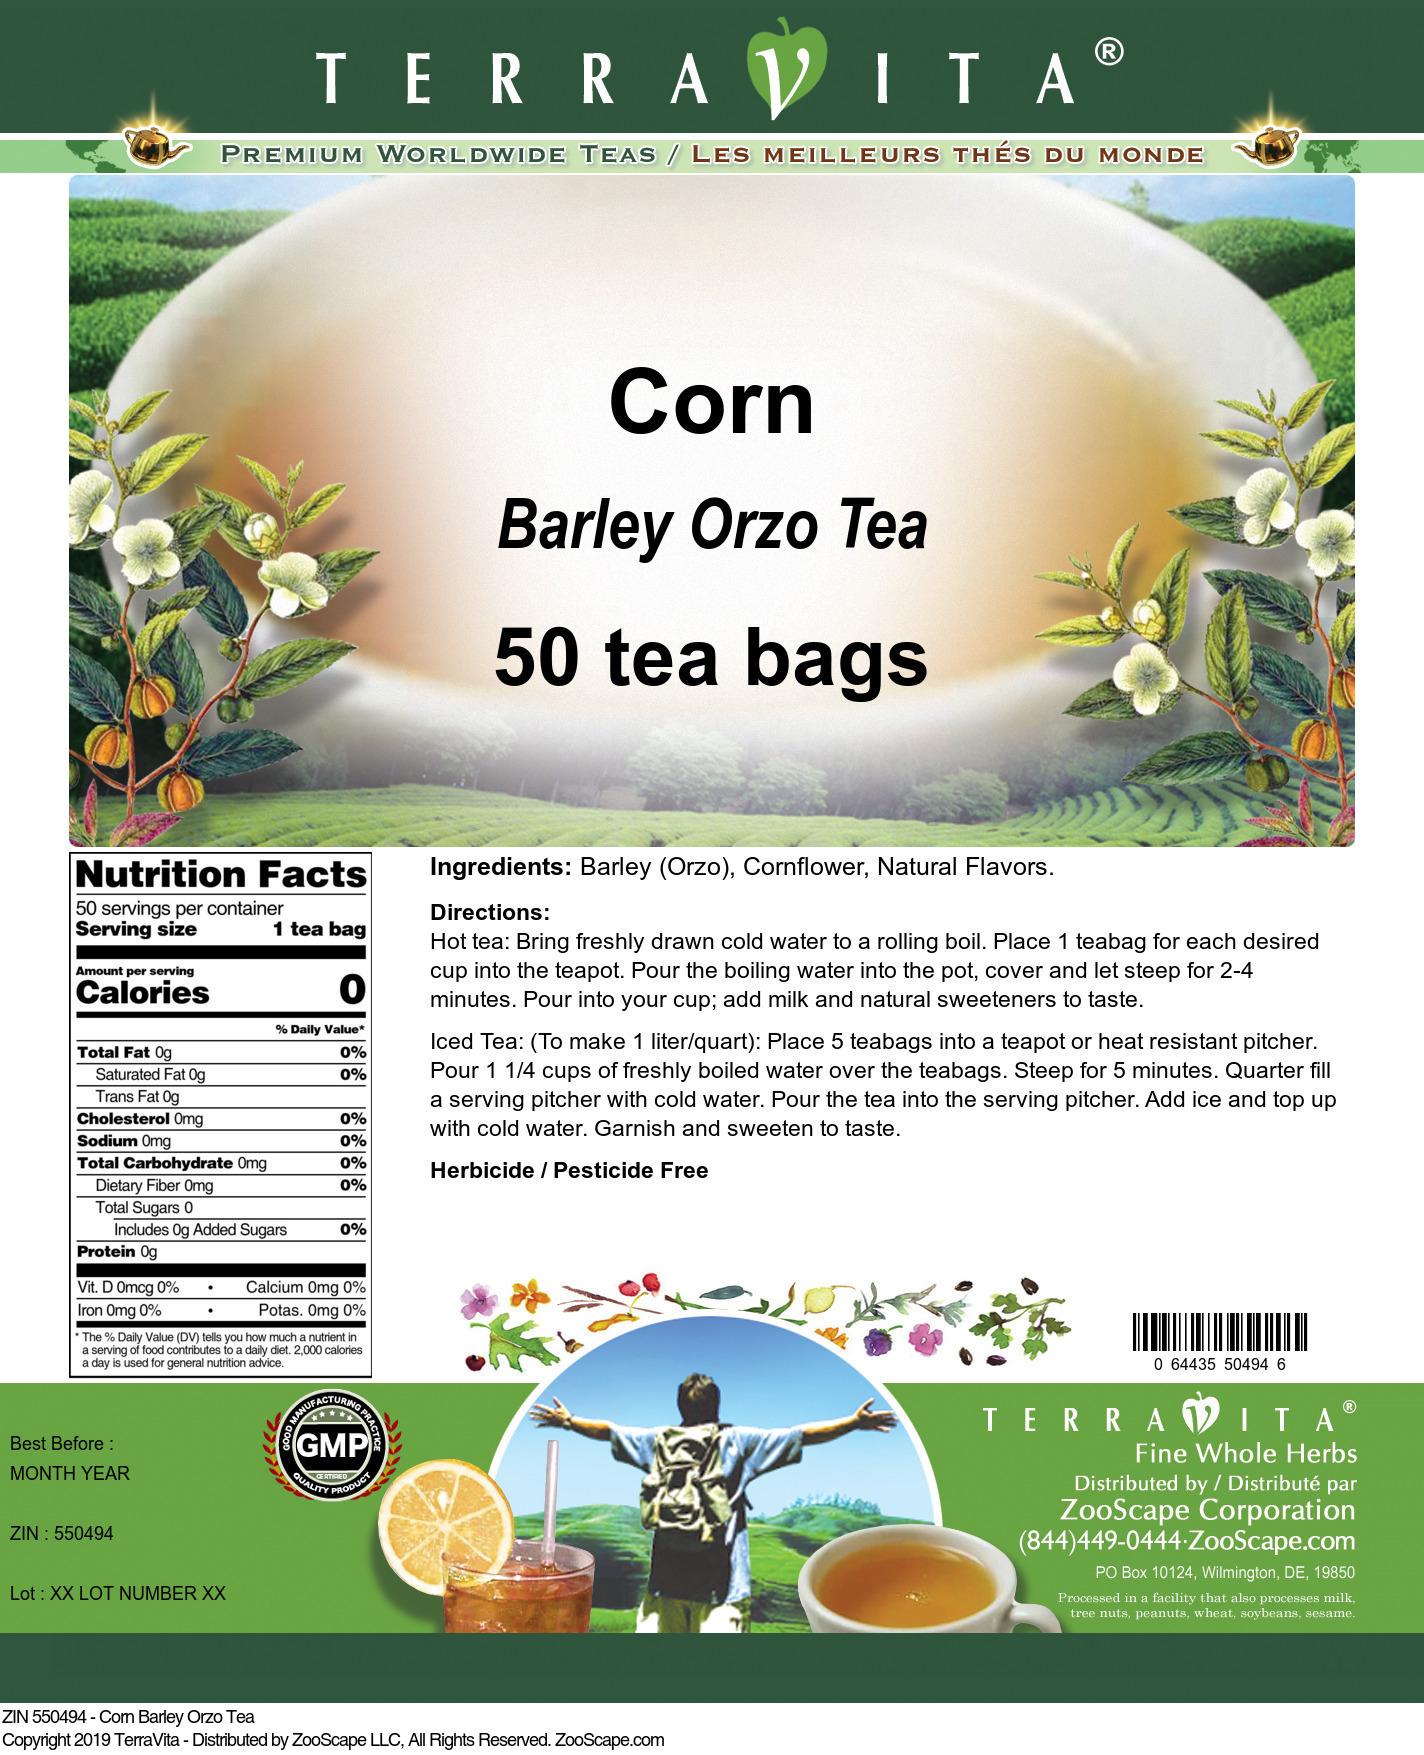 Corn Barley Orzo